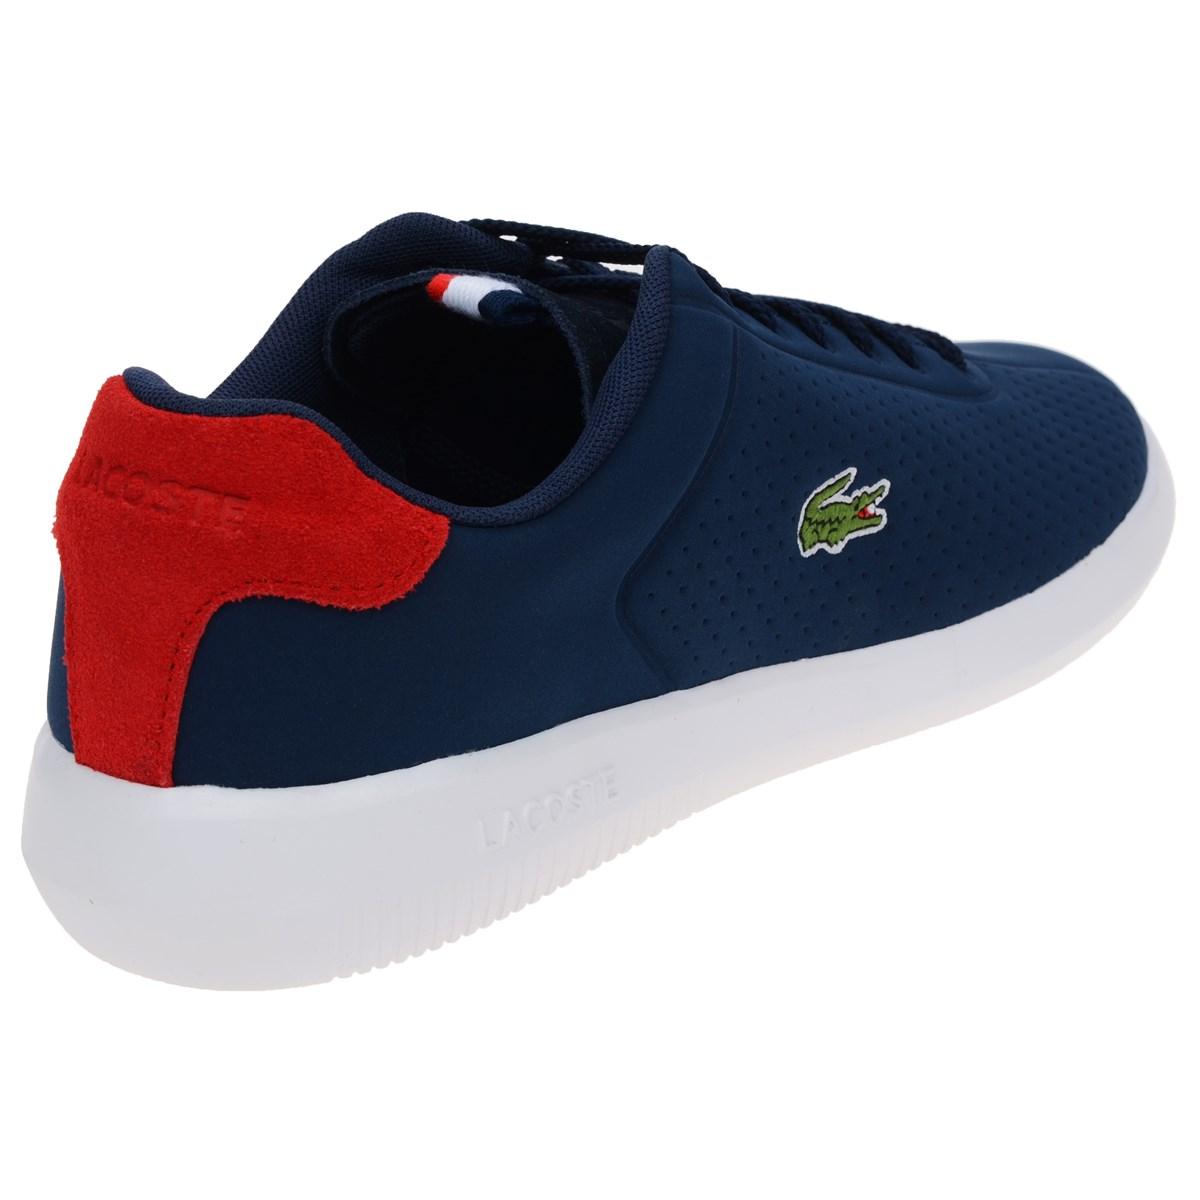 Court-Master 119 3 Erkek Lacivert Ayakkabı